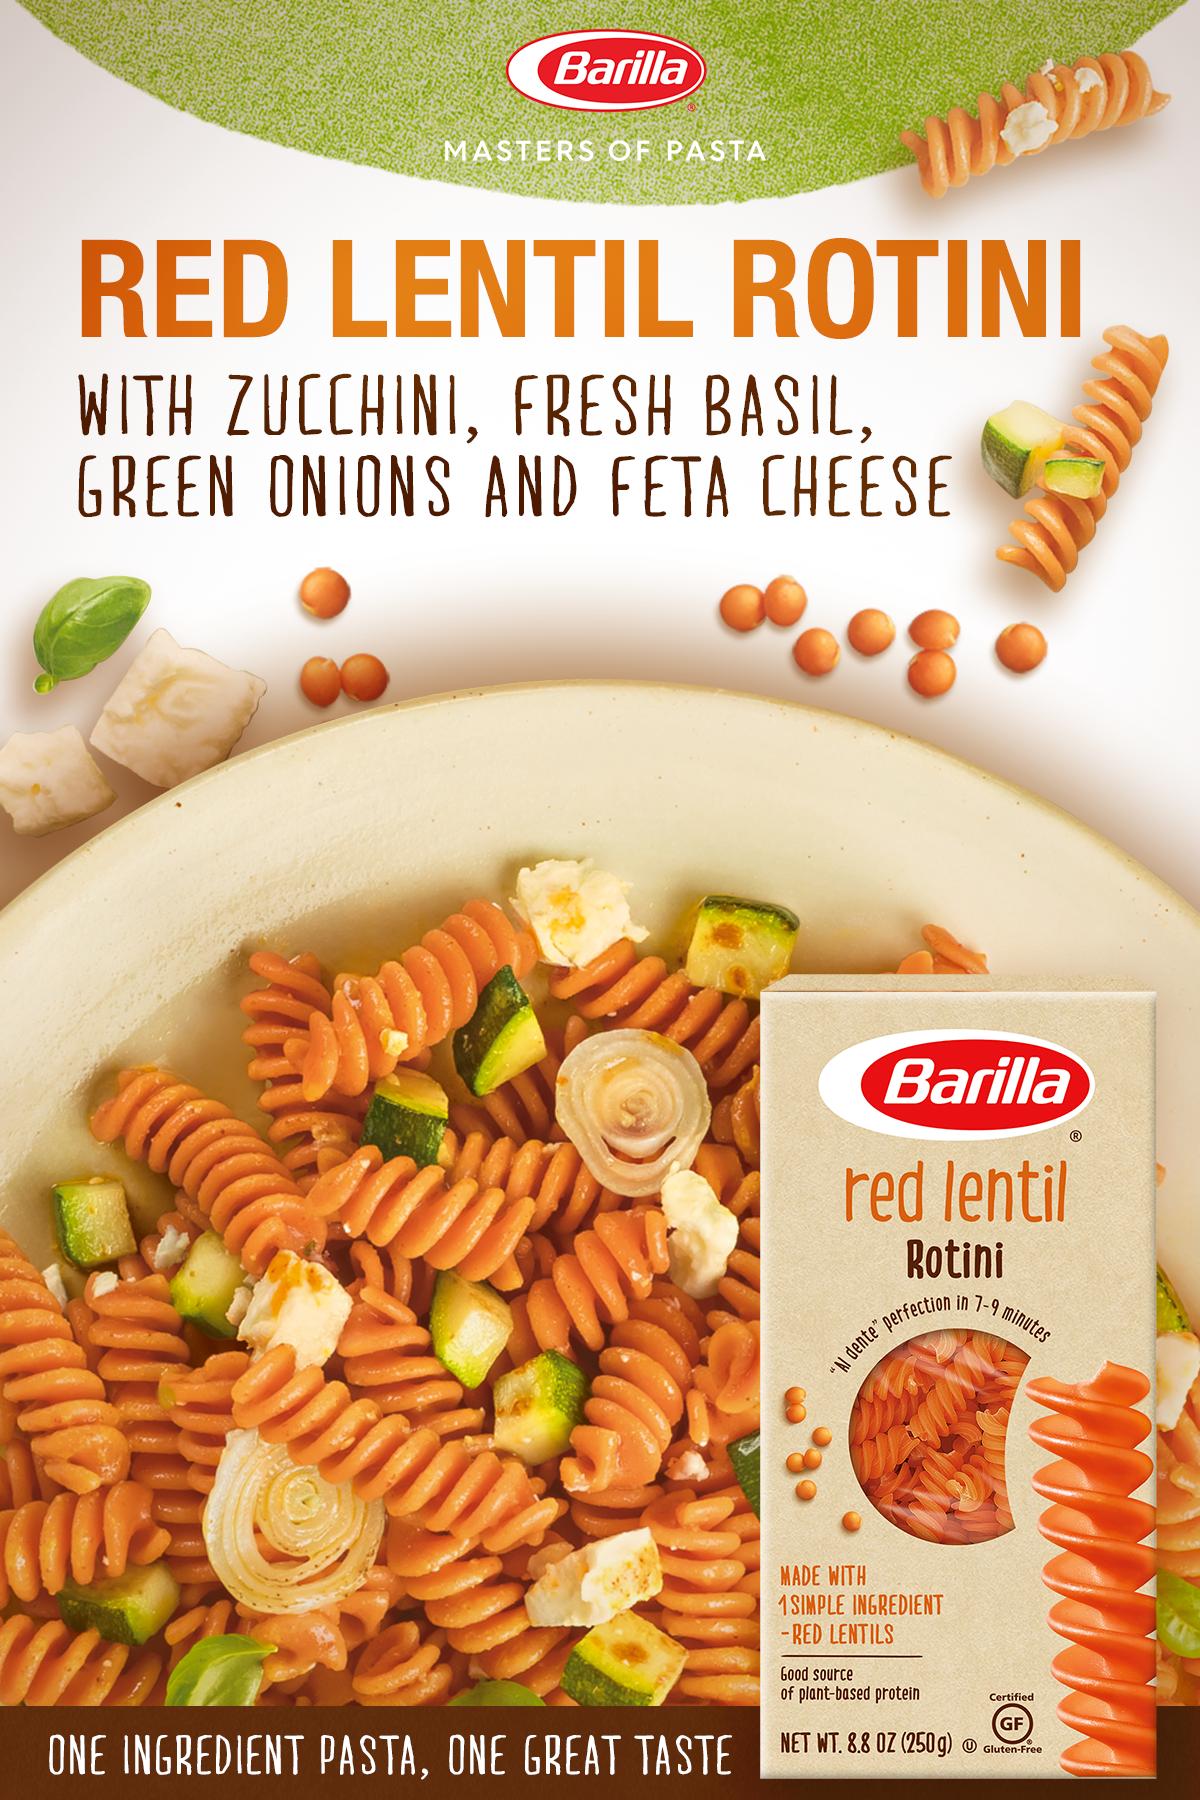 Barilla Red Lentil Rotini Salad With Zucchini Fresh Basil Green Onions Feta Cheese Recipe Vegetarian Recipes Recipes Vegetarian Pasta Recipes